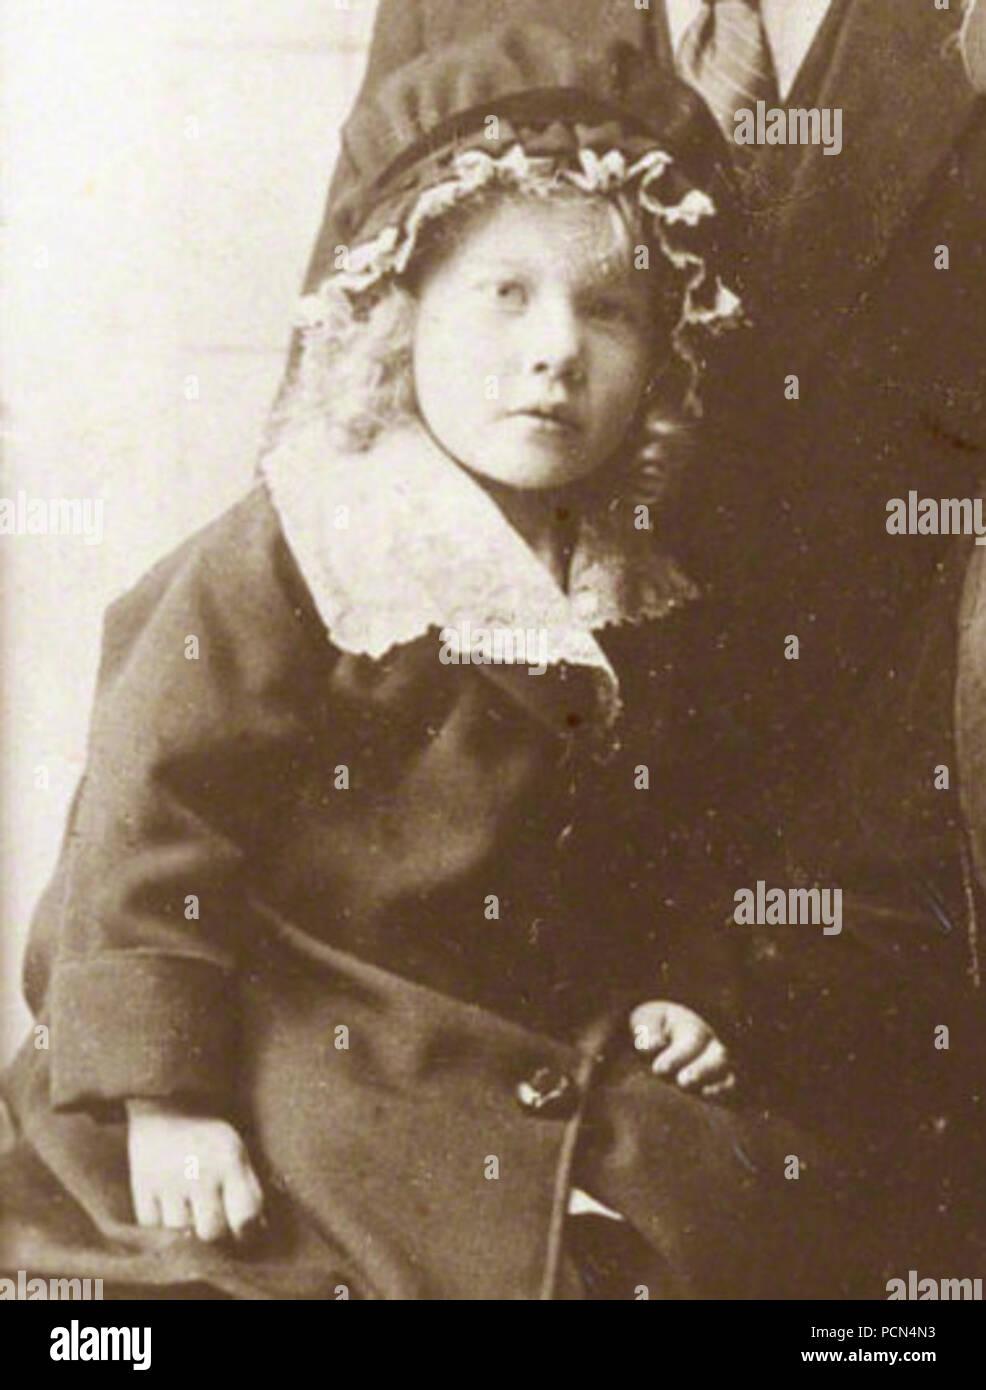 Alfie Fripp. Photo Stock